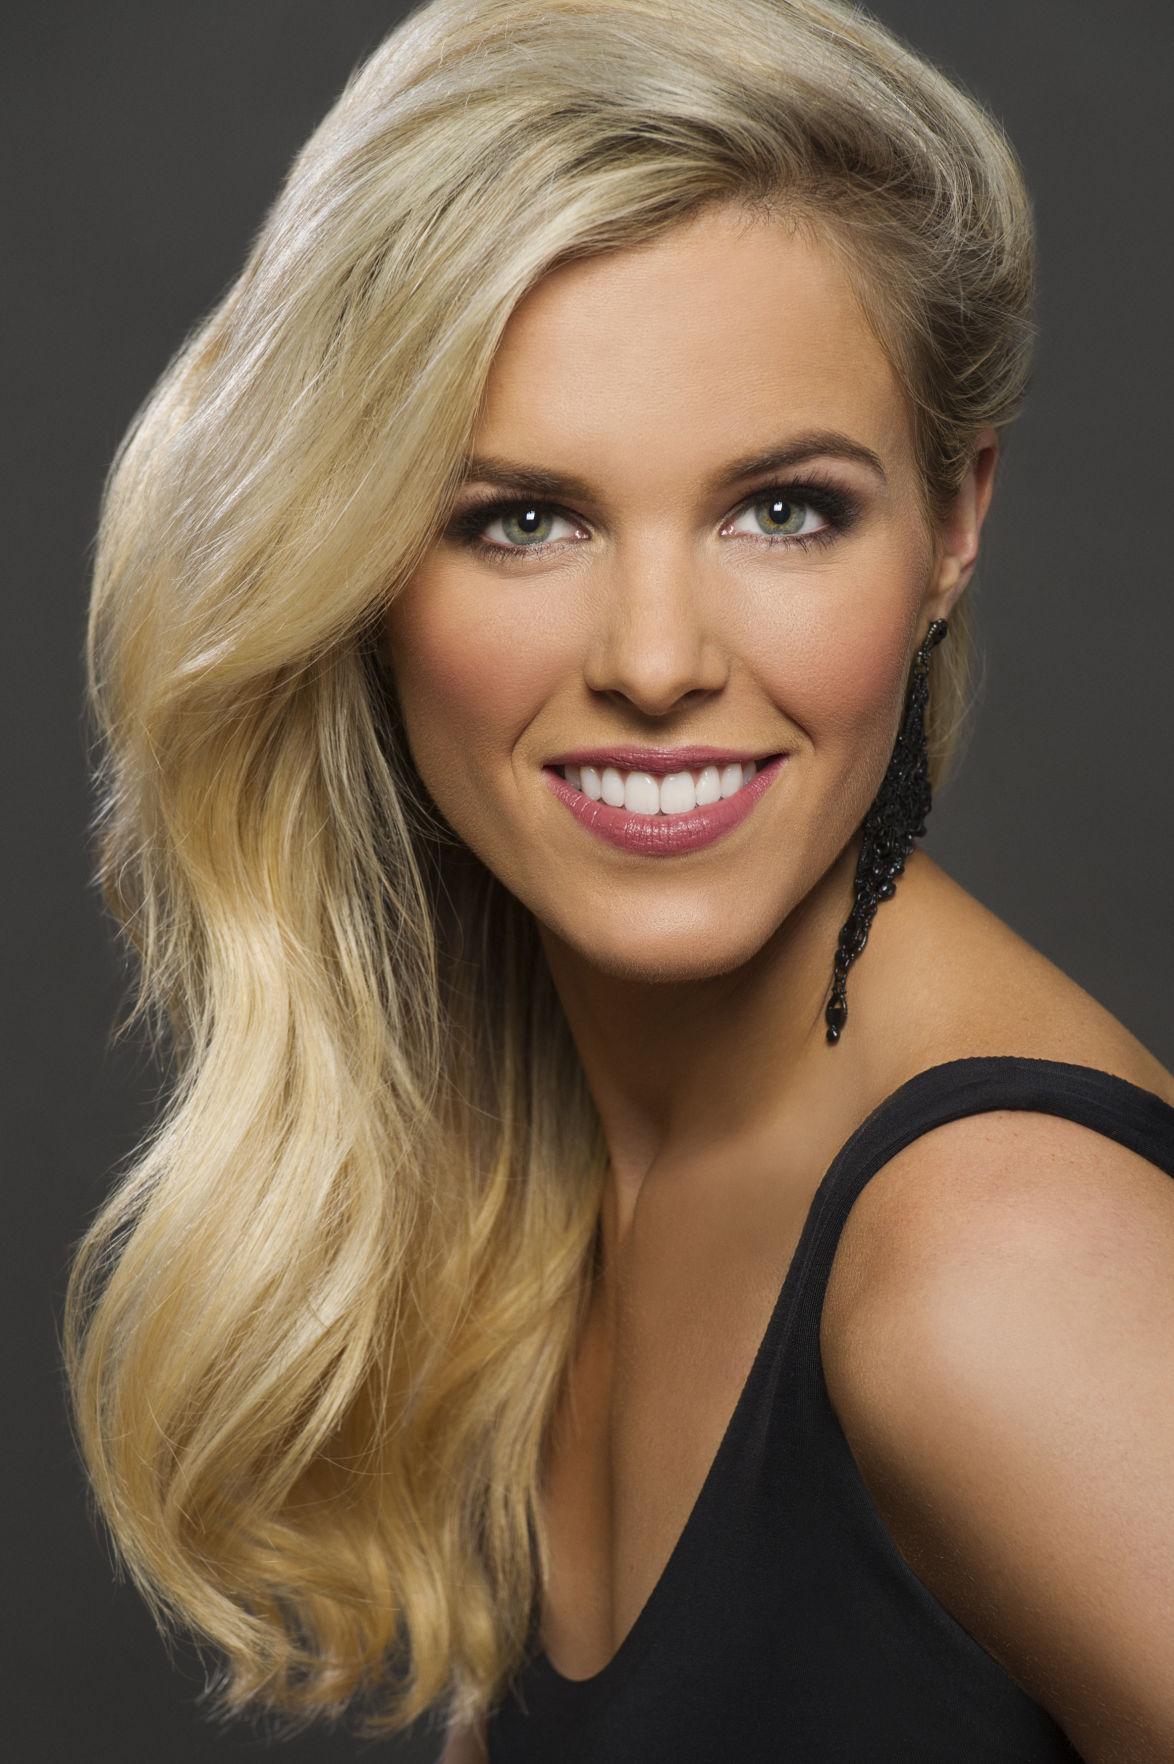 Miss Michigan 2017 Heather Kendrick